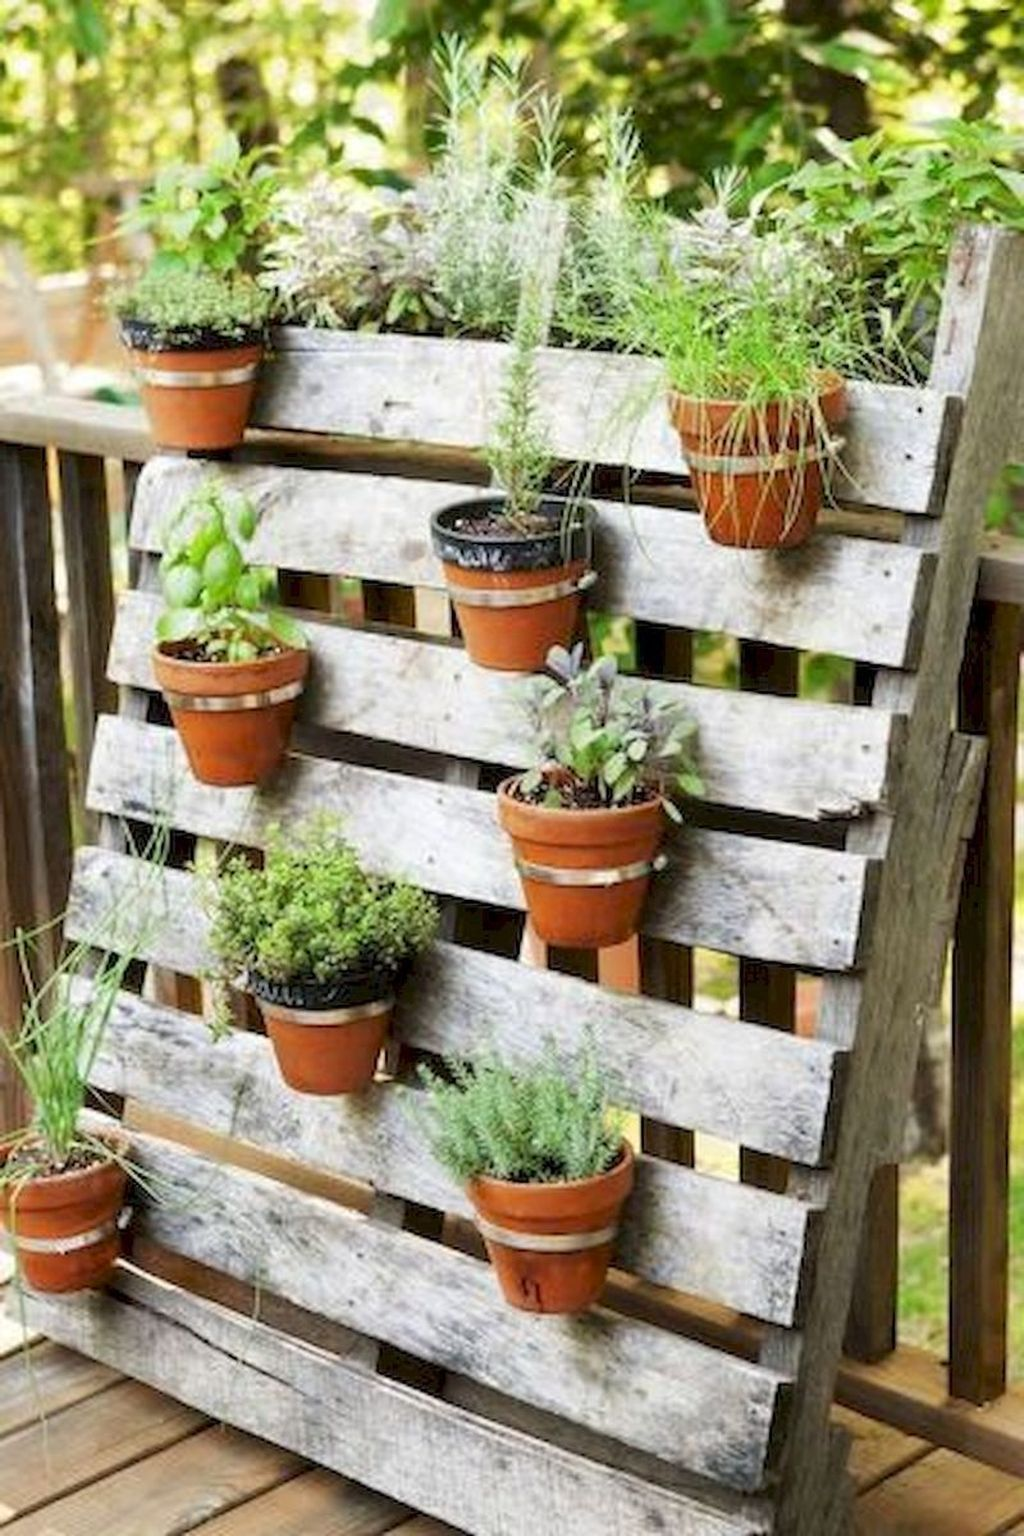 35 Brilliant Diy Projects Pallet Garden Design Ideas On A Budget